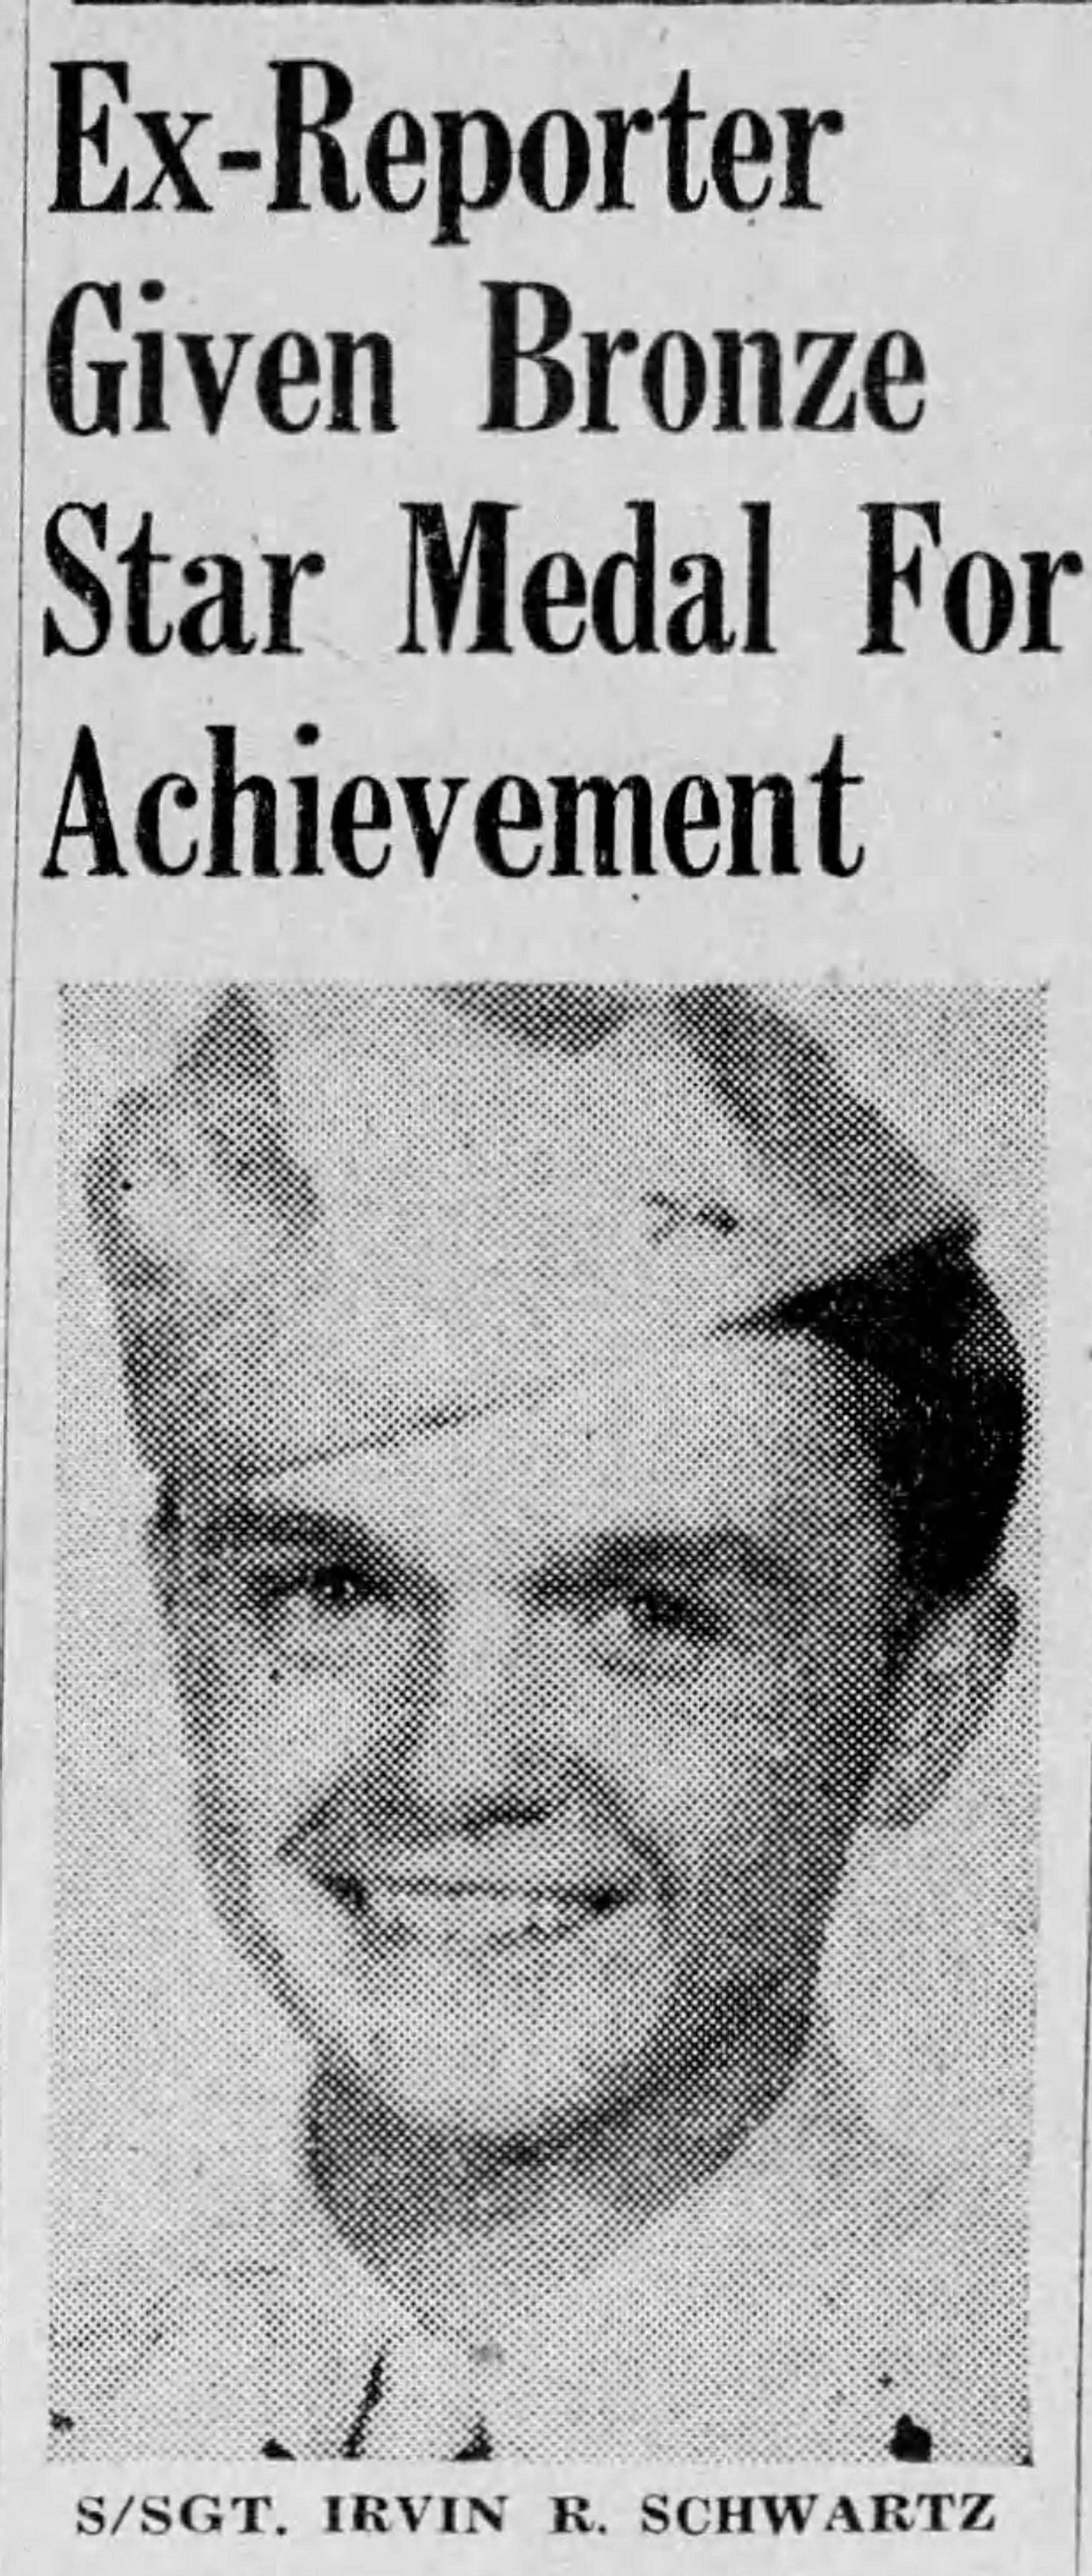 The_West_Schuylkill_Press_and_Pine_Grove_Herald_Fri__Mar_9__1945_